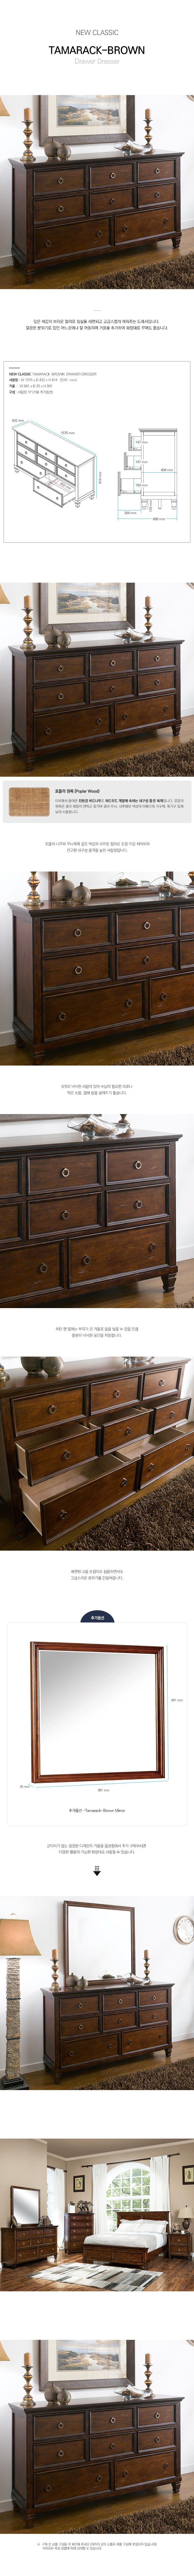 tamarack_brown_Drawer-Dresser_180511.jpg